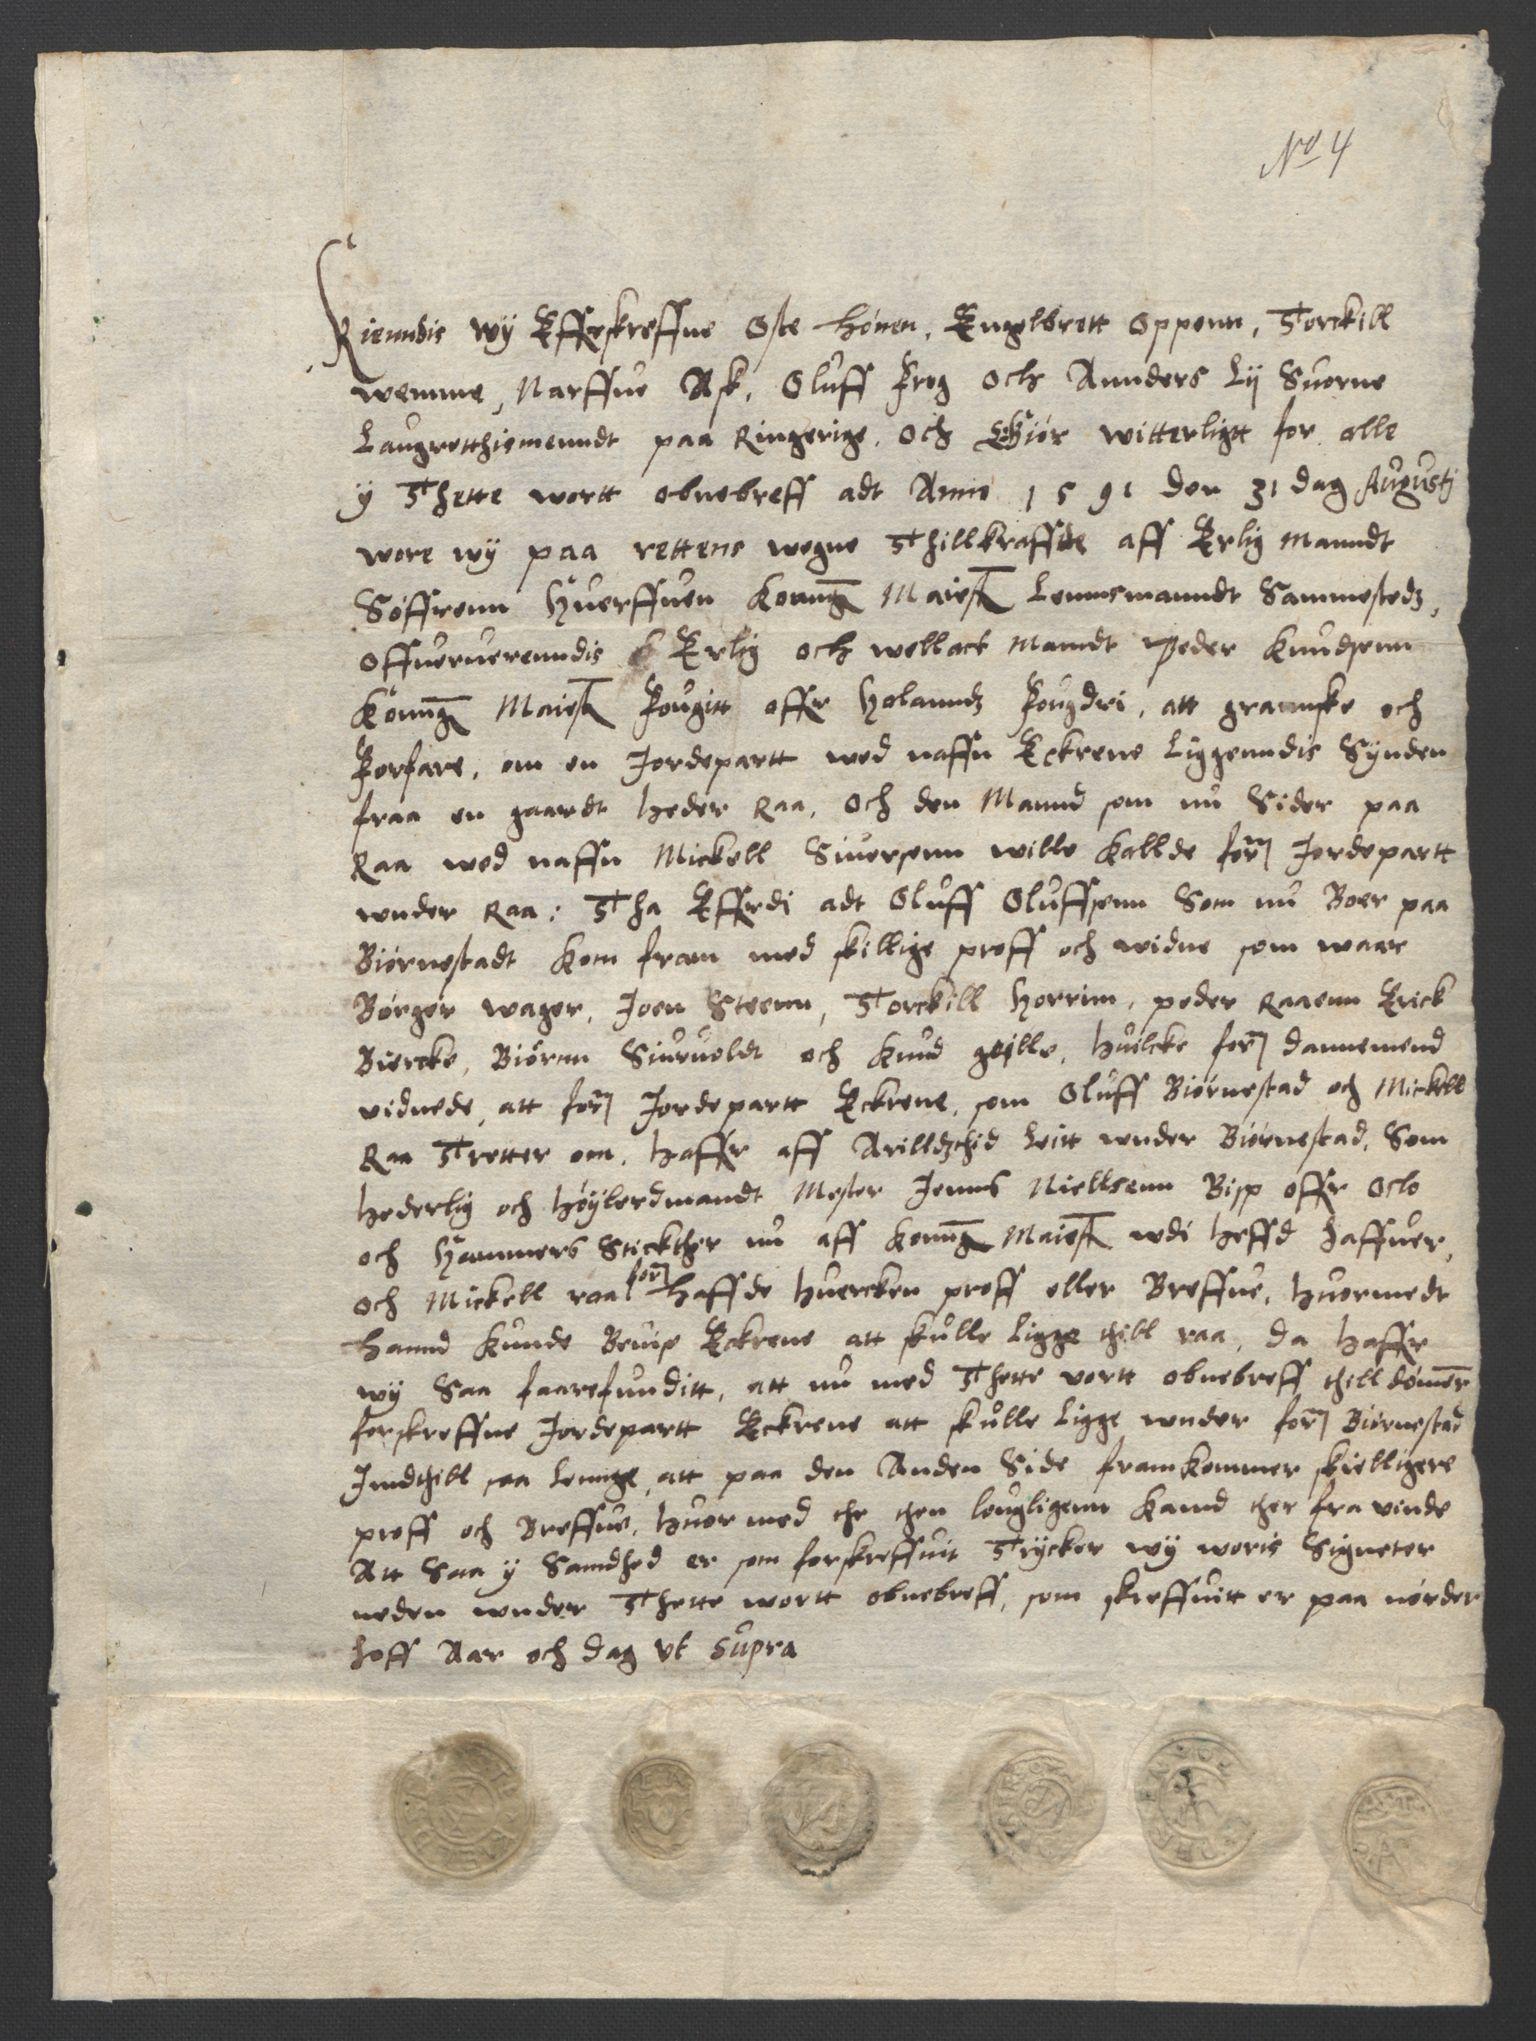 SAO, Oslo stiftsdireksjon, G/Gb/L0001: Bispestolens dokumenter, 1584-1612, s. 4